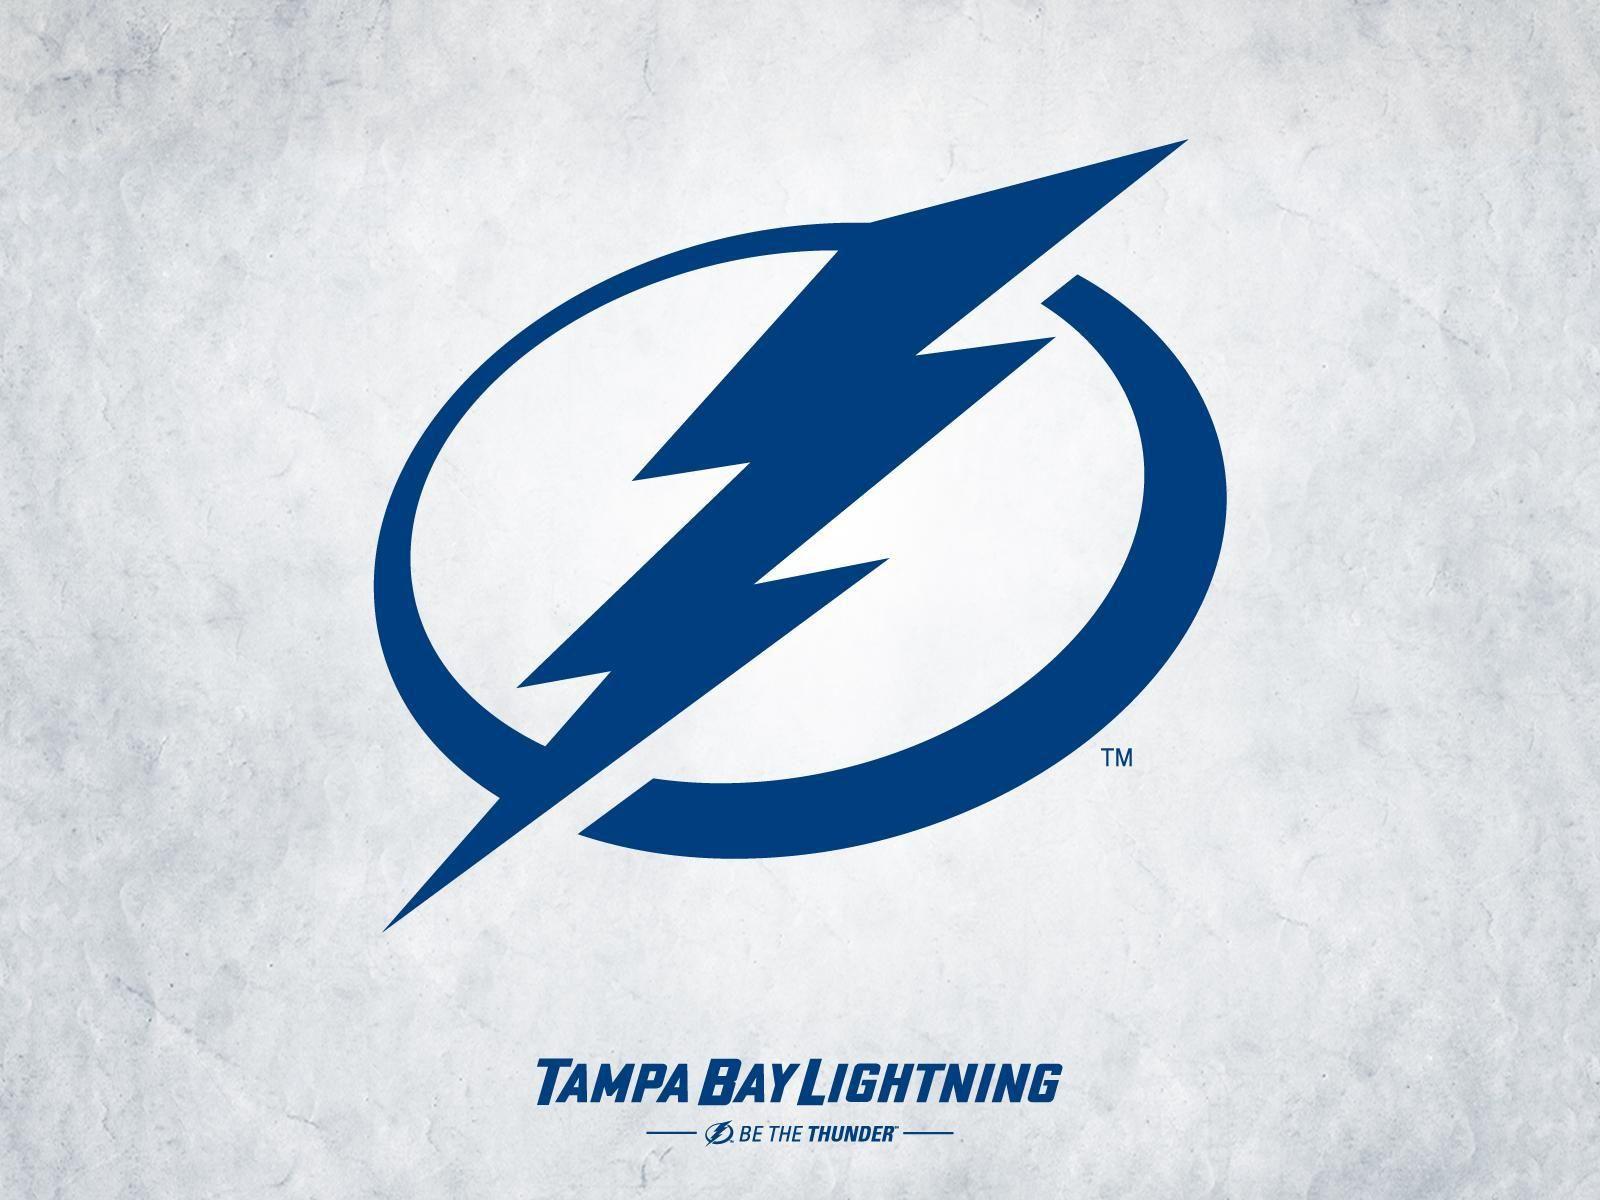 Tampa Bay Lightning Cool Wallpapers Wallpapersafari